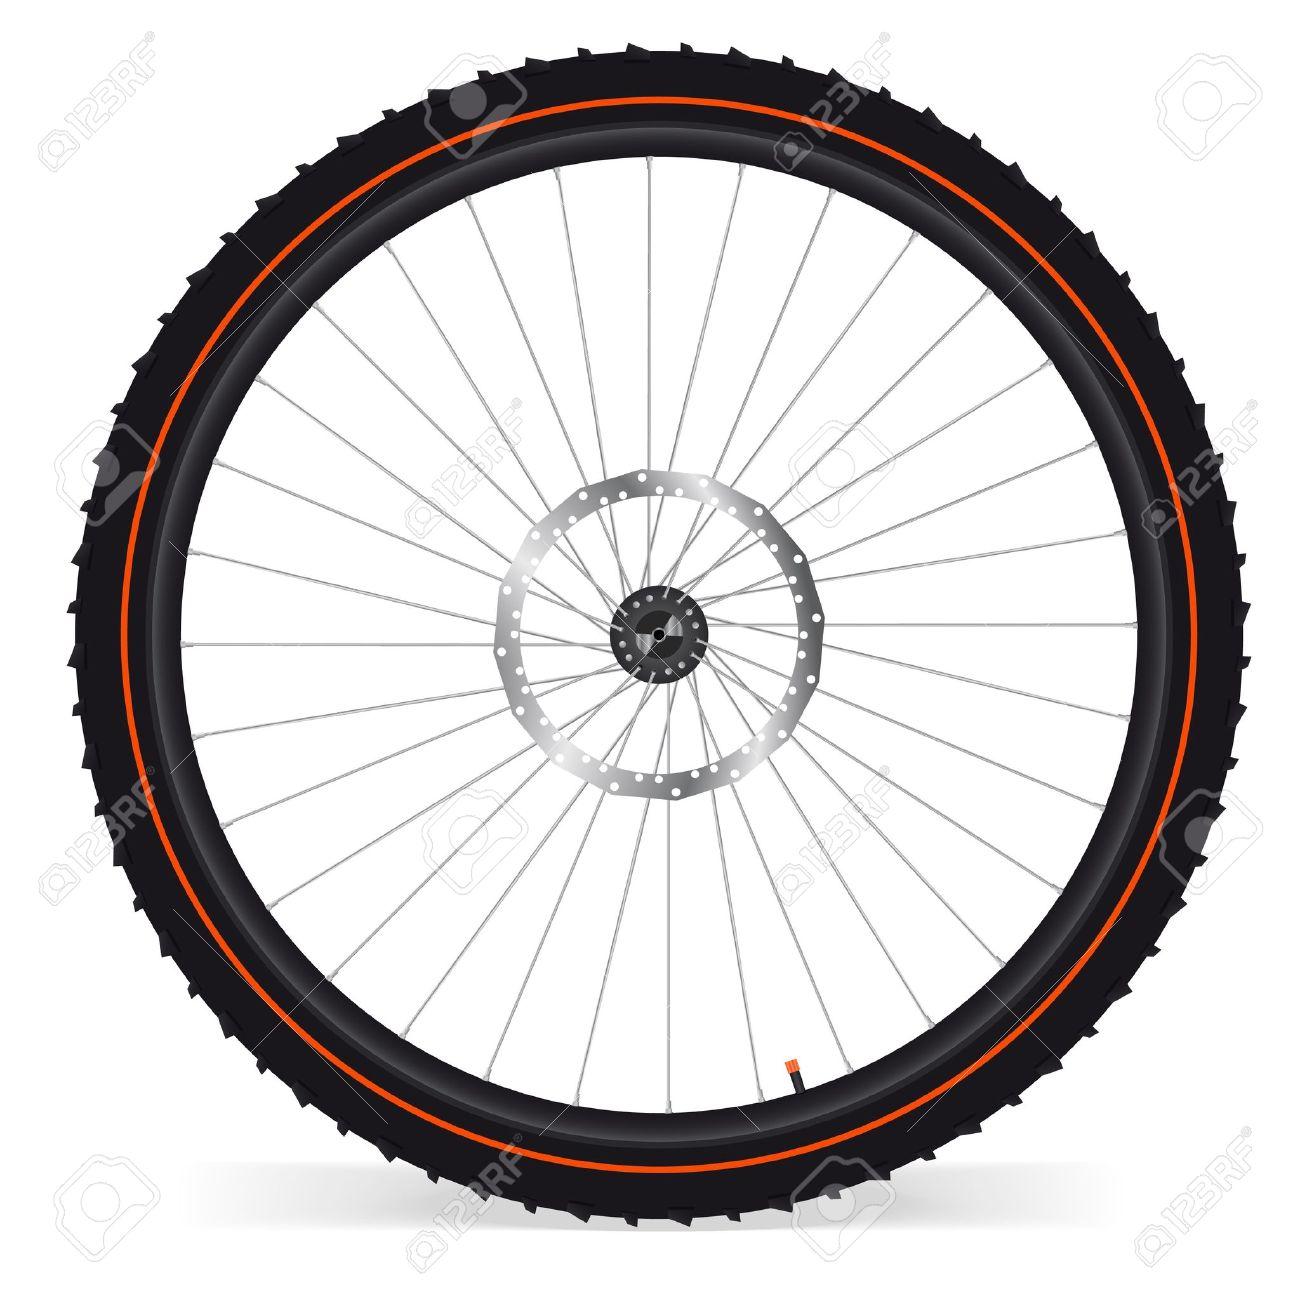 1300x1300 Bike Clipart Bicycle Wheel